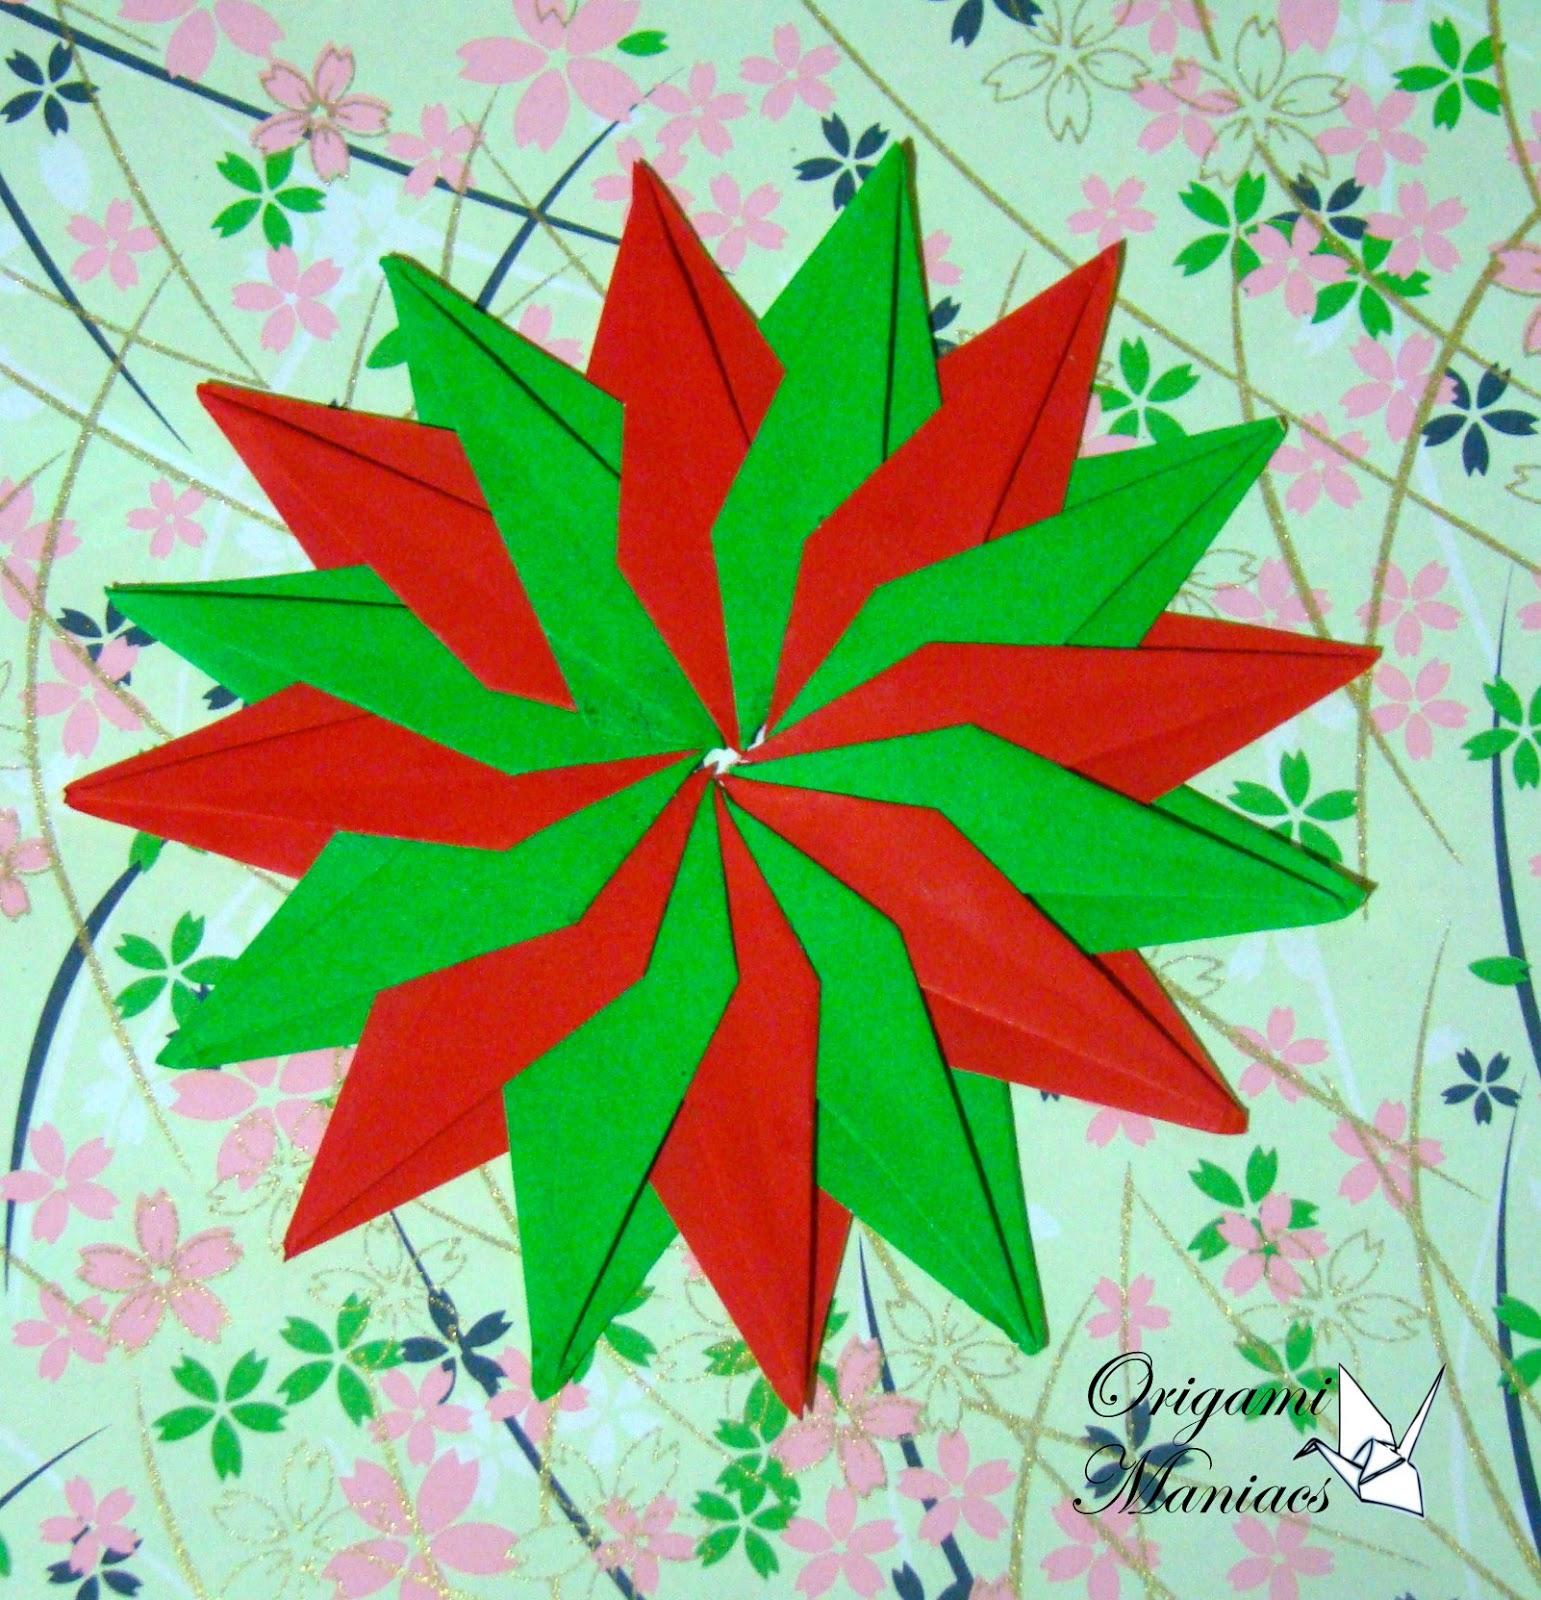 Origami Maniacs Origami Mandalas For Christmas Trees